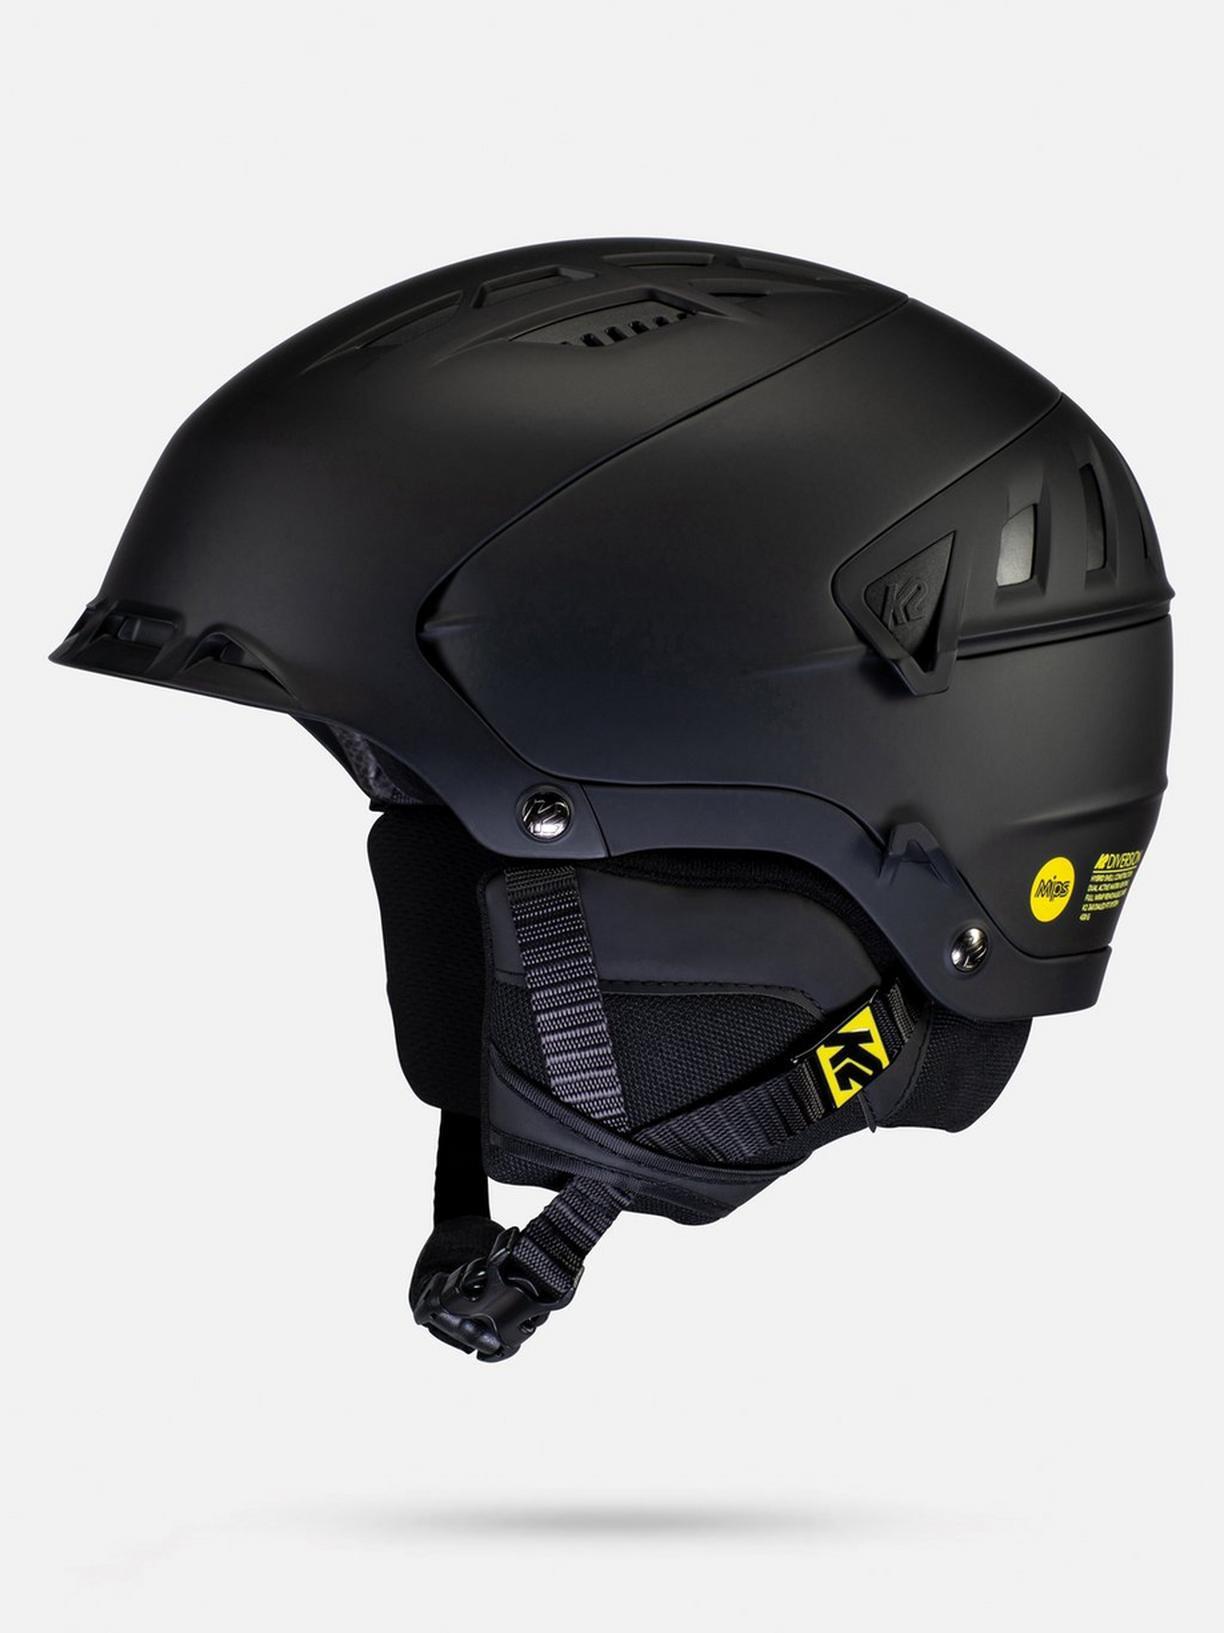 K2 Diversion Mips 2021